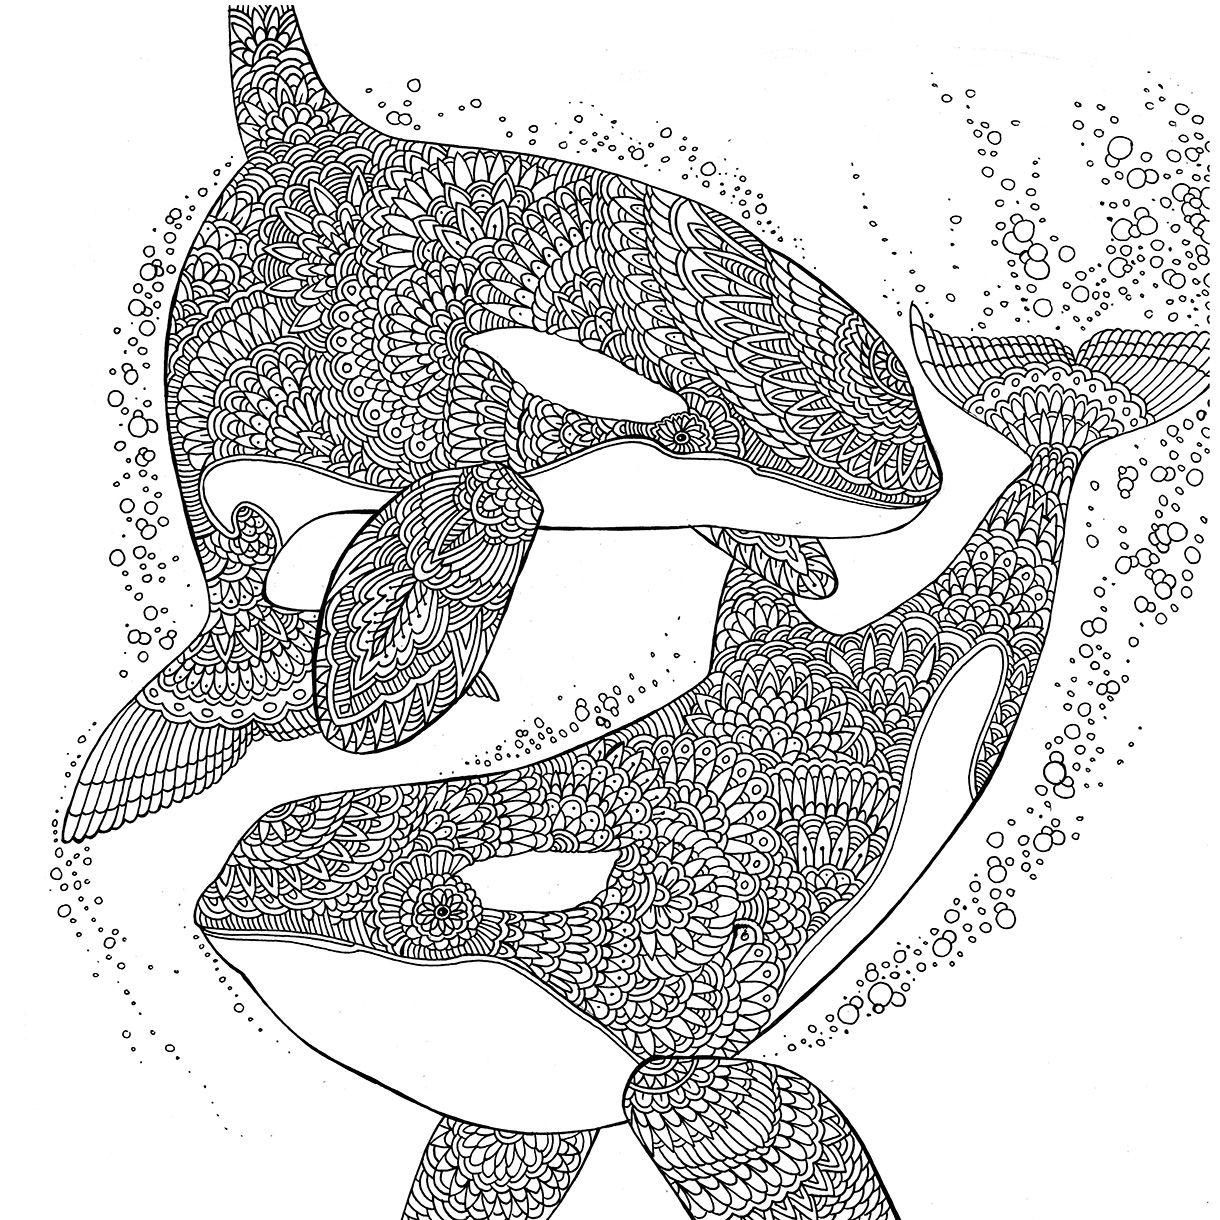 Orcas The Aquarium Colouring Book Richard Merritt Orcas Aquarium Adultcolouring Colouringbook Illustration Mandala Kleurplaten Kleurplaten Kleurboek